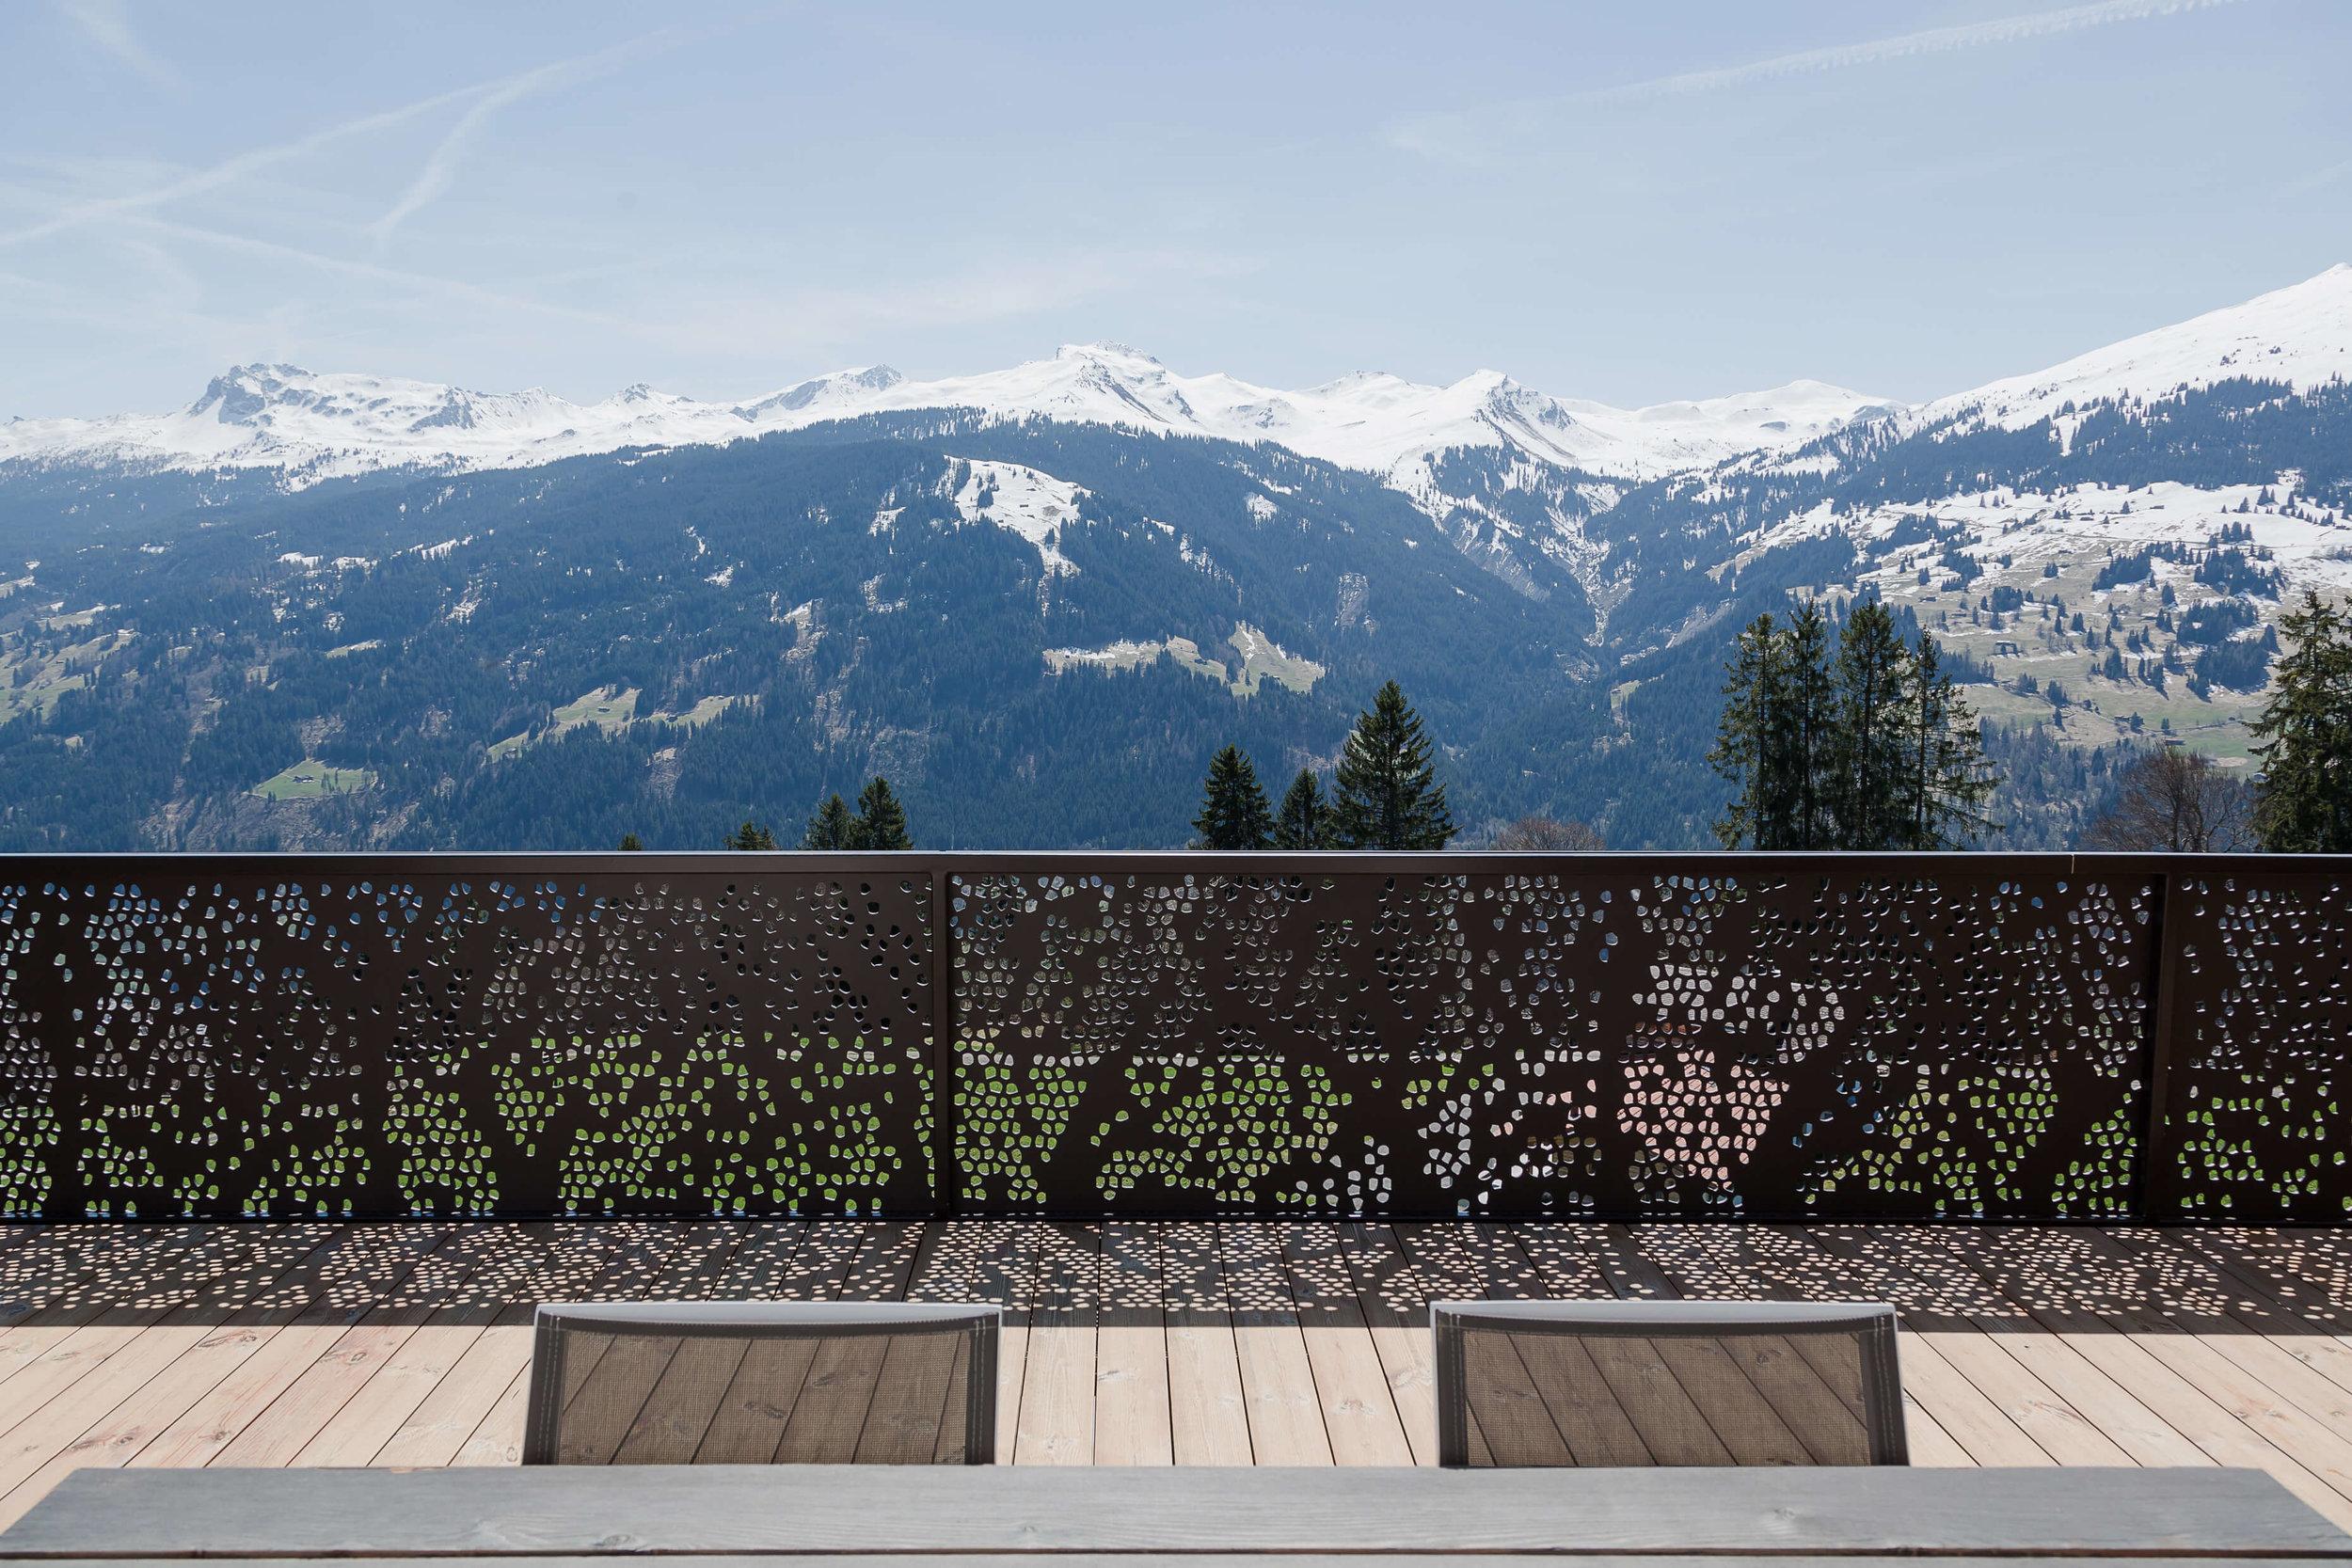 Balcony-Cladding-Bruag_Cellon-8mm_Perforation-10100-scaled-7.jpg